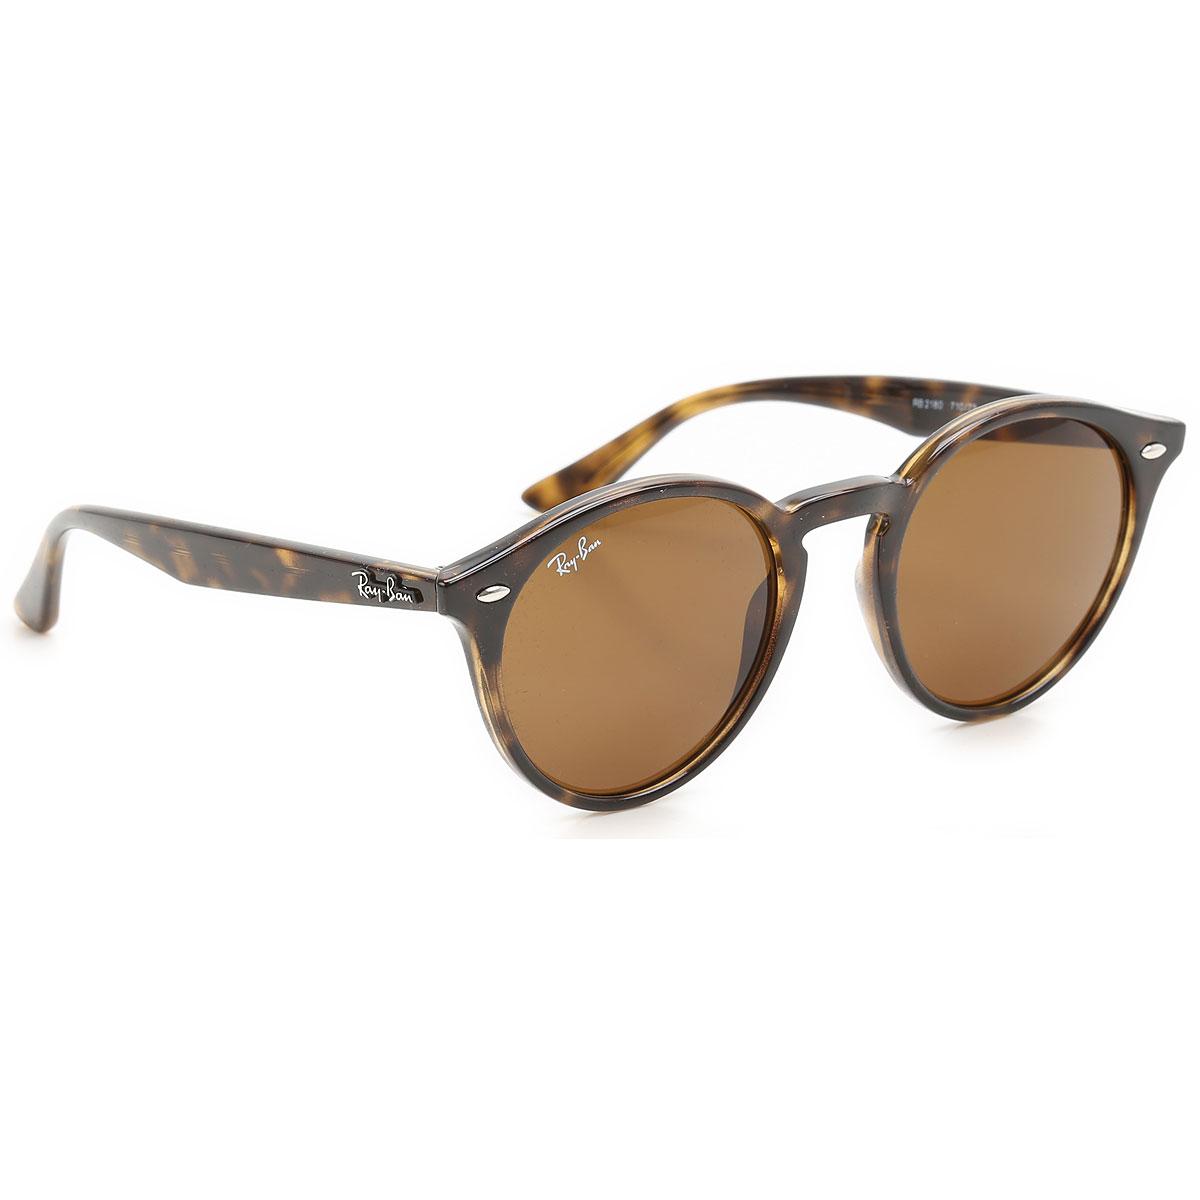 Ray Ban Sunglasses On Sale, 2019